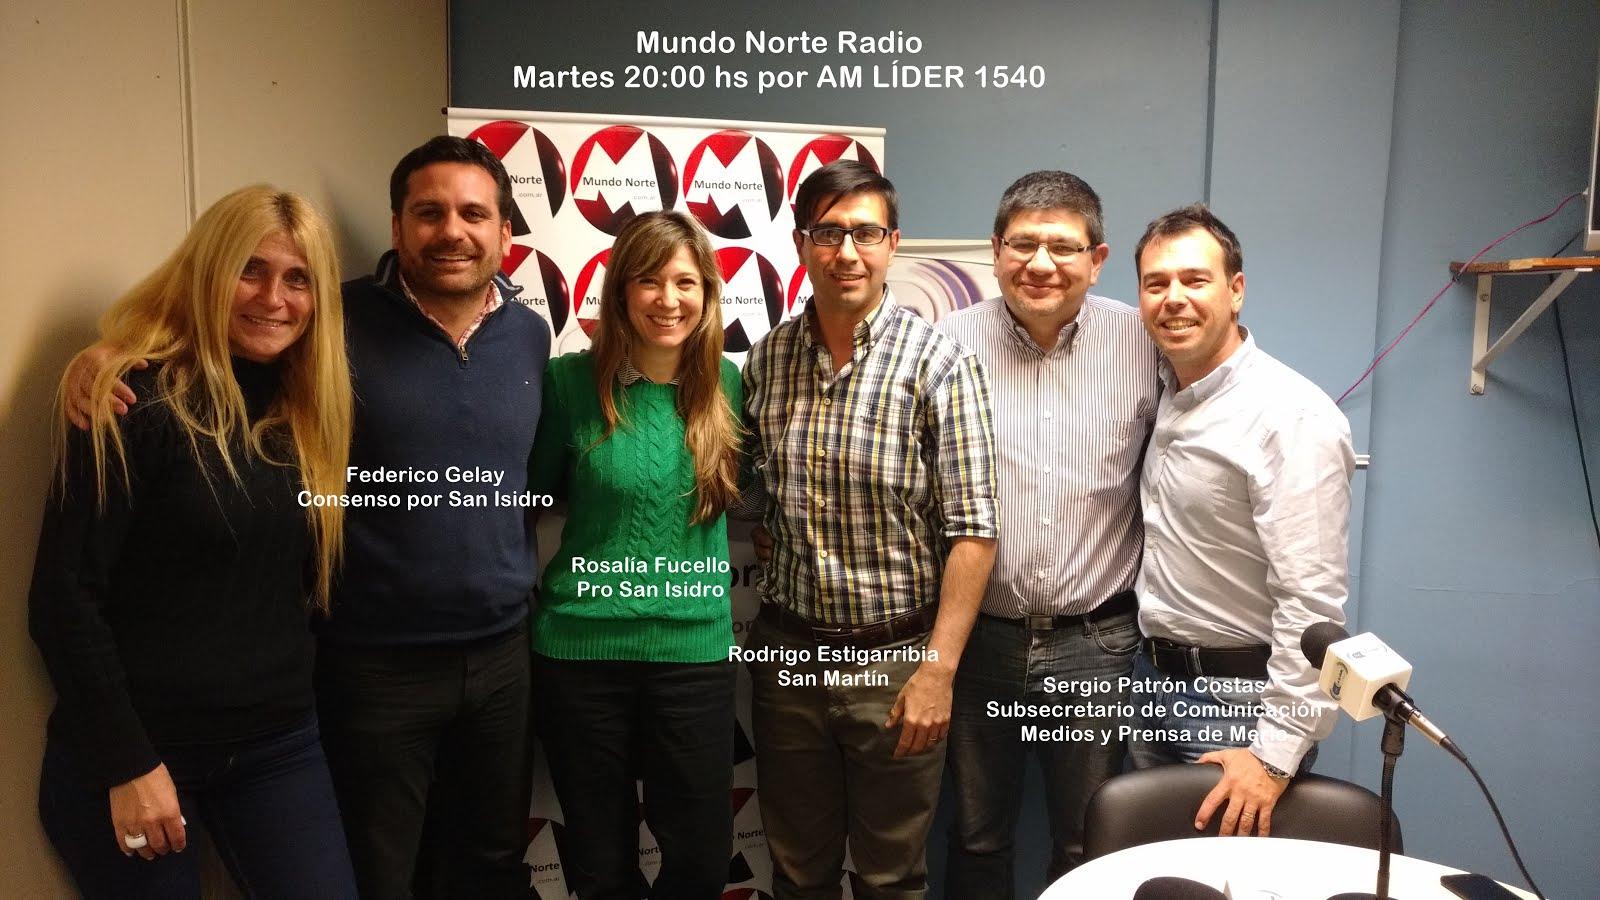 Mundo Norte Radio